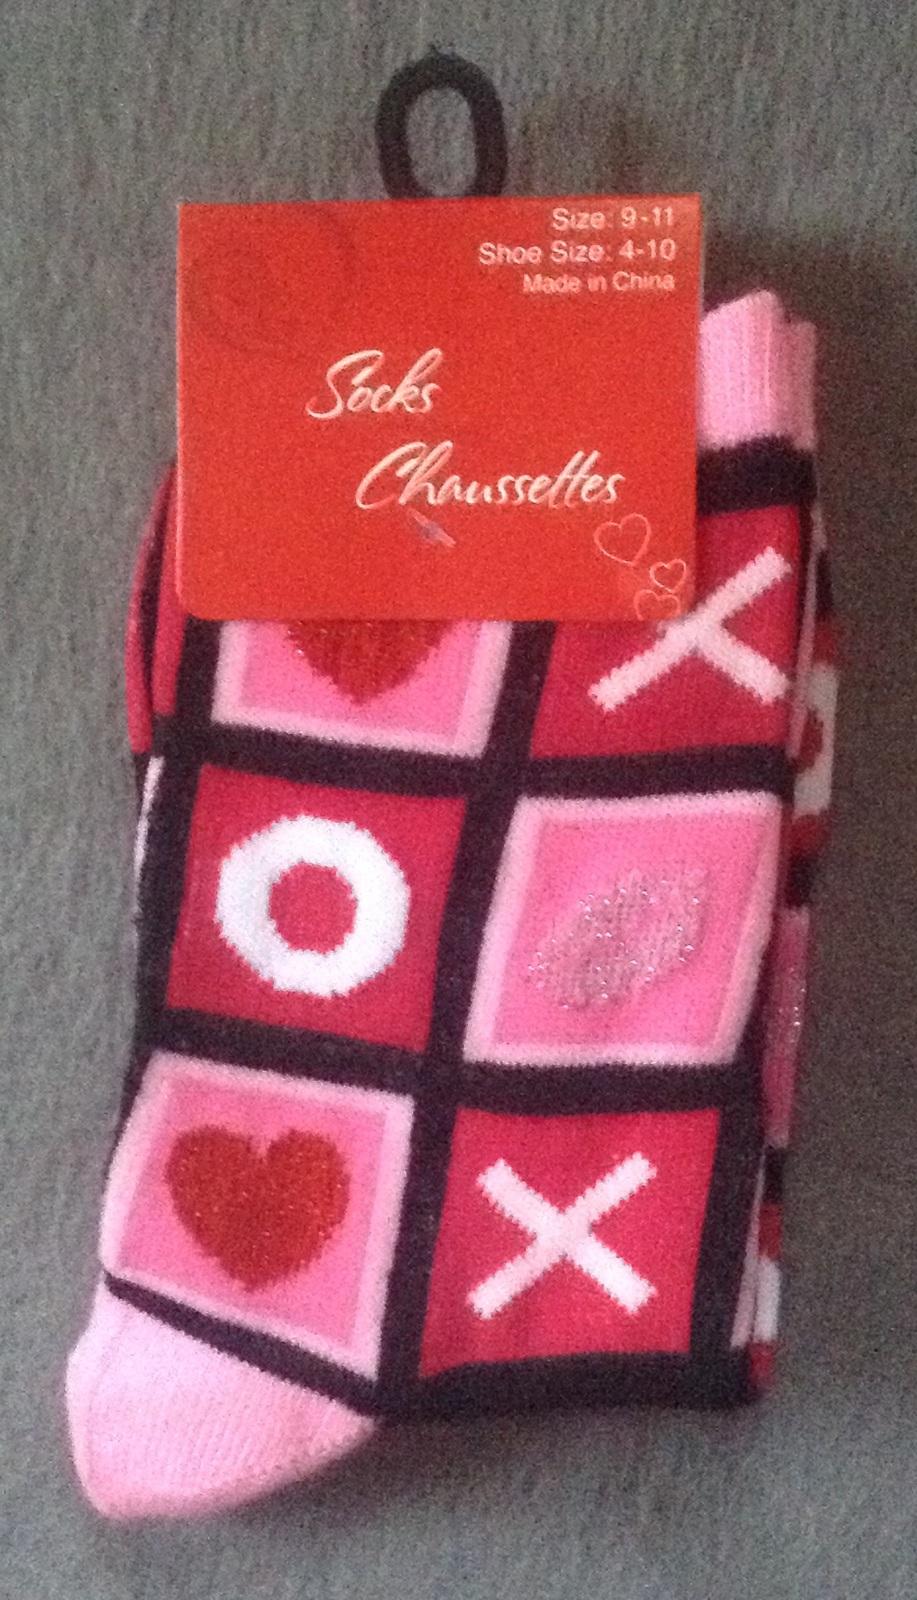 1 Pair Ladies Women's Valentine's Day Sock XX OO Hearts size 9-11 4-10 - $2.99